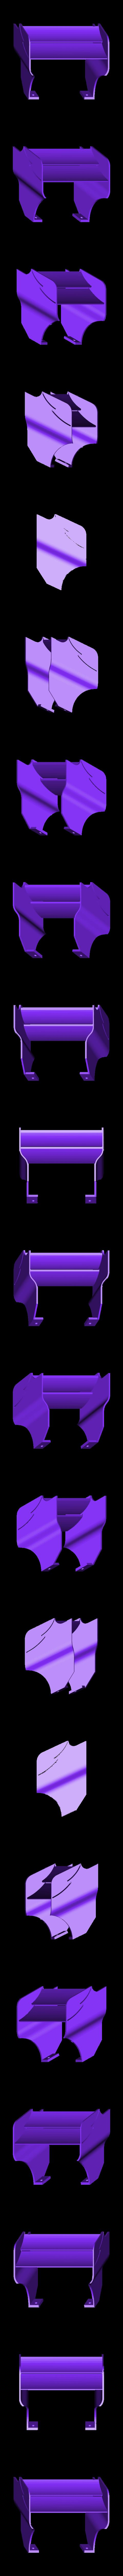 Rear_Wing_Color_1.stl Download free STL file OpenRC F1 Dual Color McLaren Edition • 3D printer model, DanielNoree